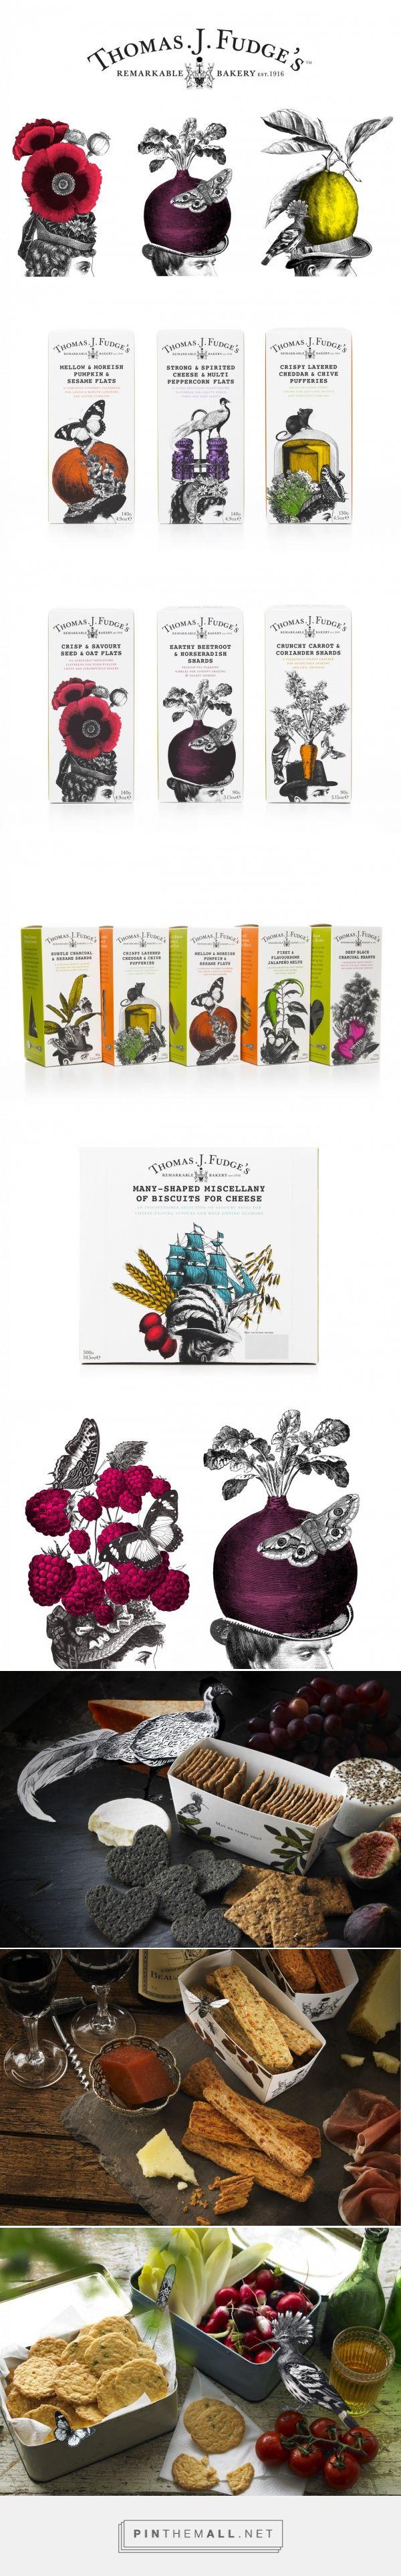 Thomas J Fudge's « big fish® – #branding #design #packaging